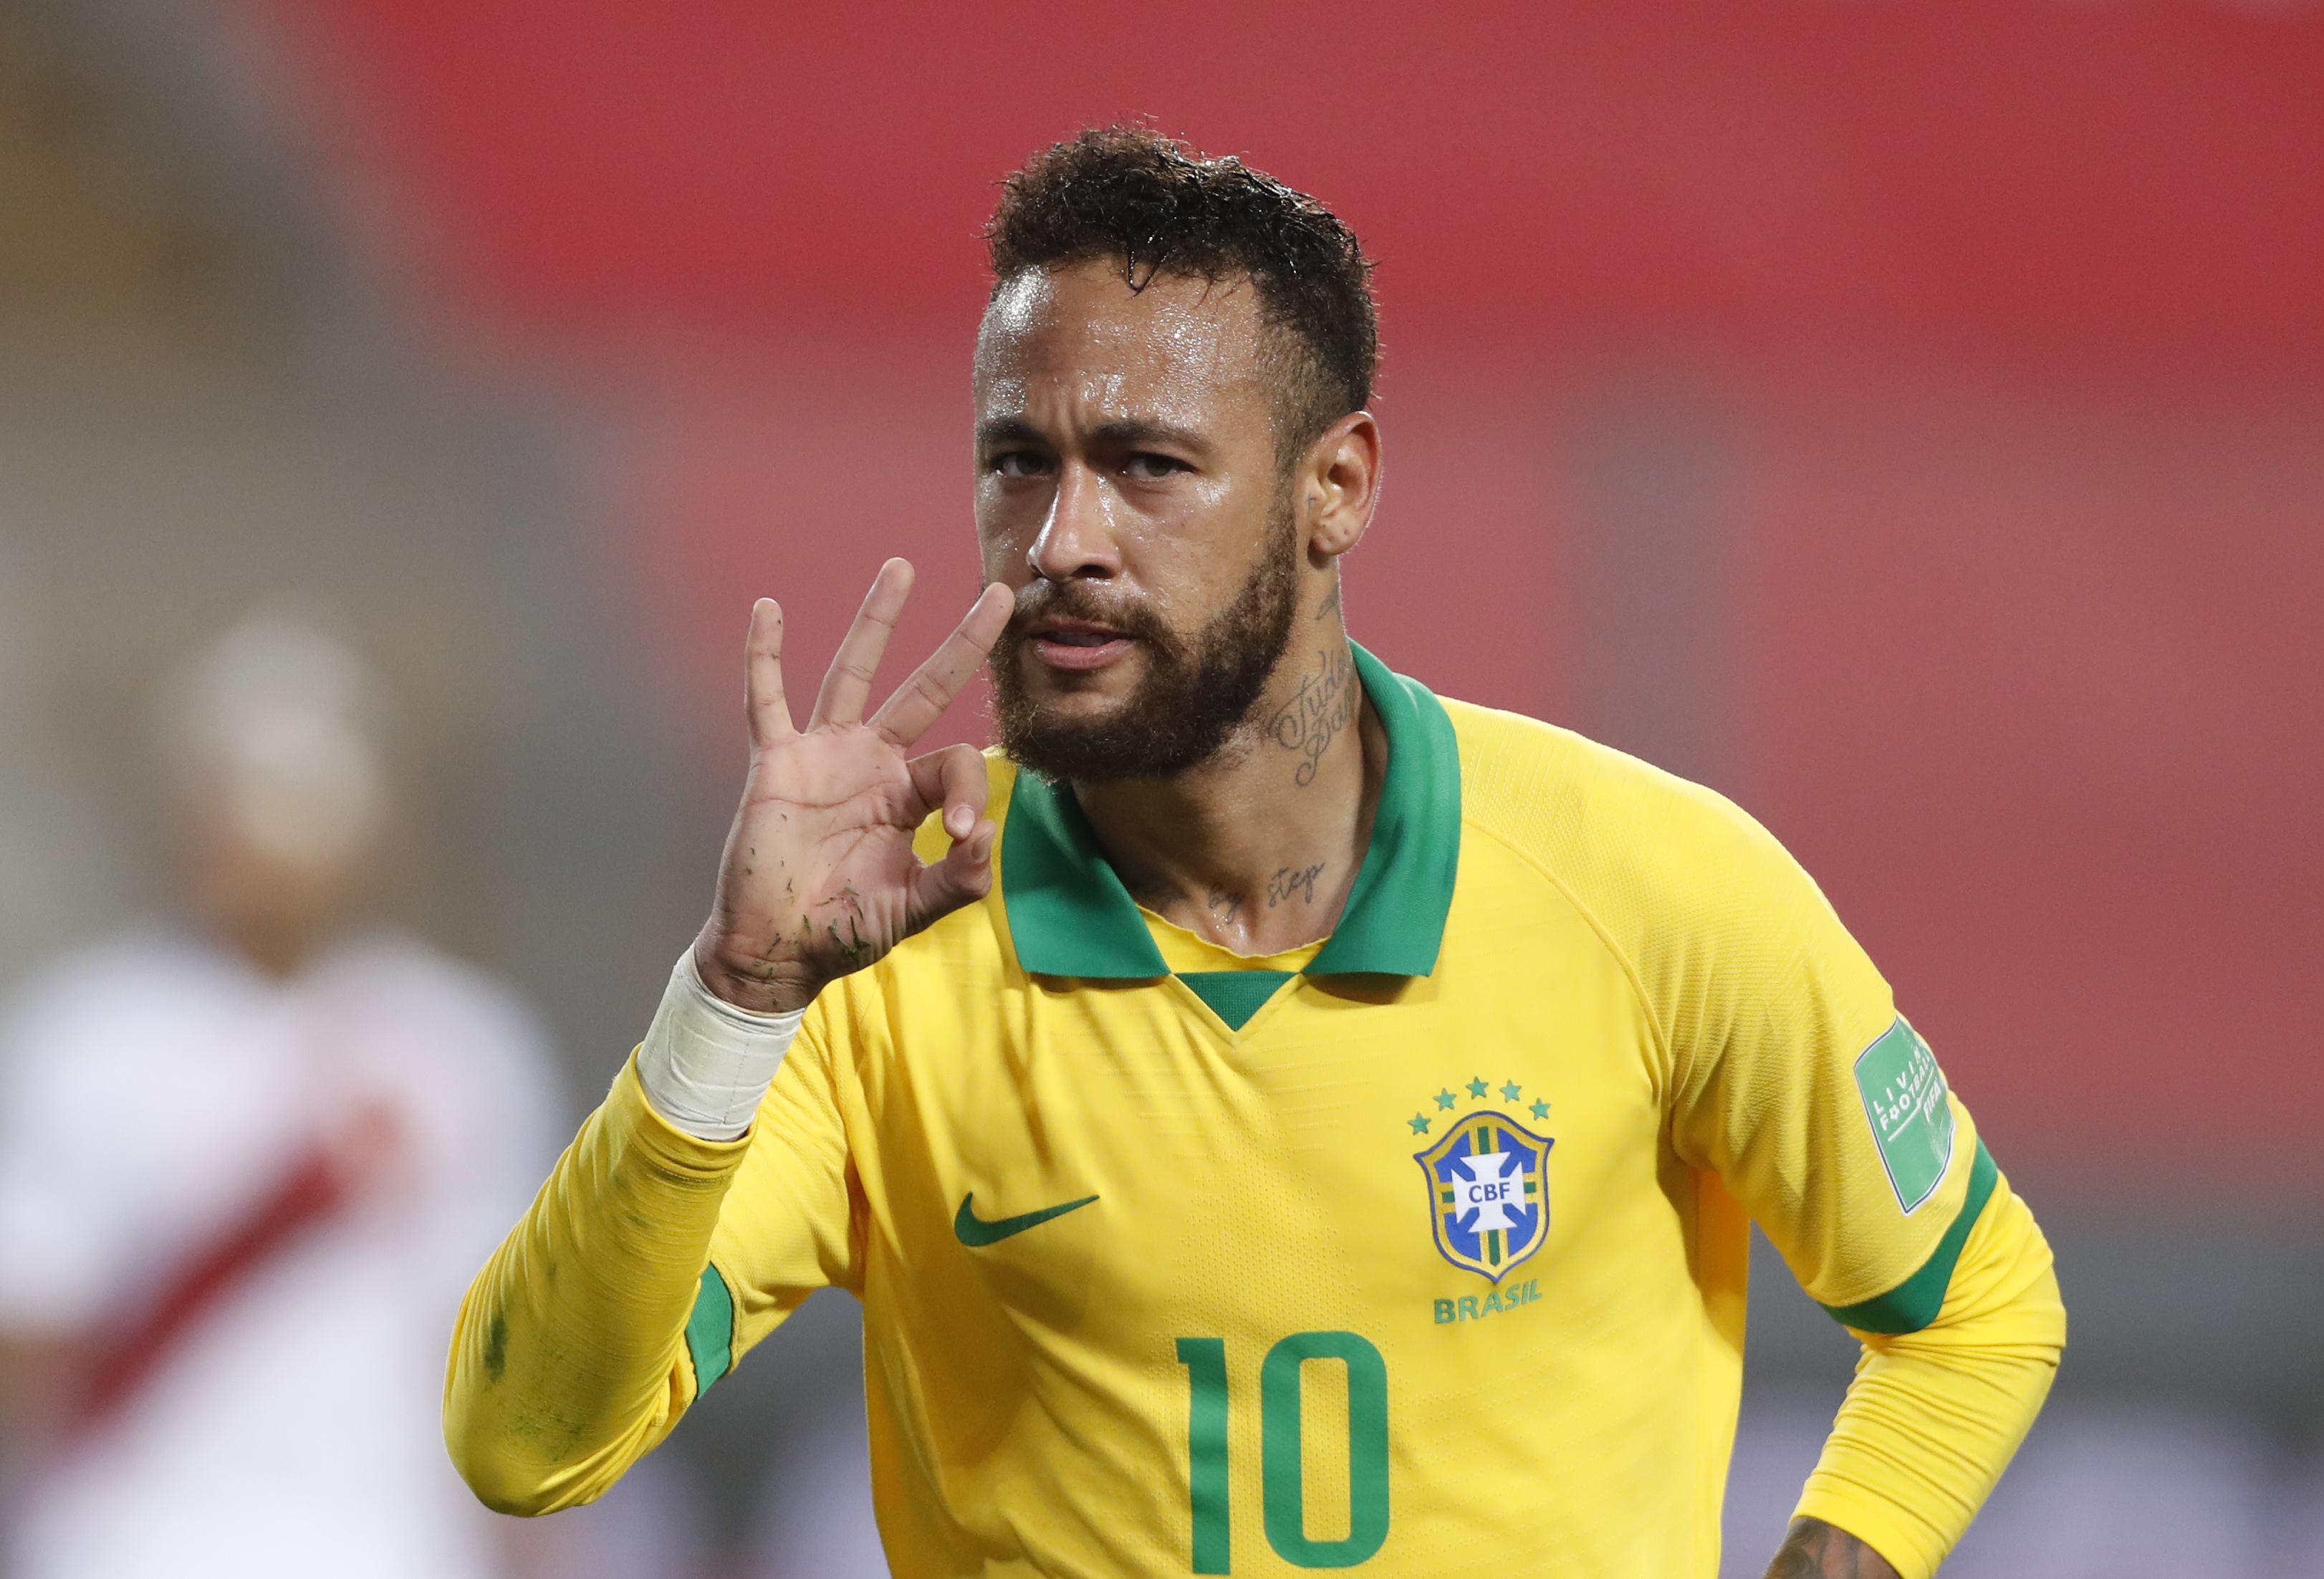 Brazil Vs Venezuela Live Stream 11 13 20 Watch Conmebol 2022 Fifa World Cup Qualifier Online En Vivo Time Tv Channel Nj Com